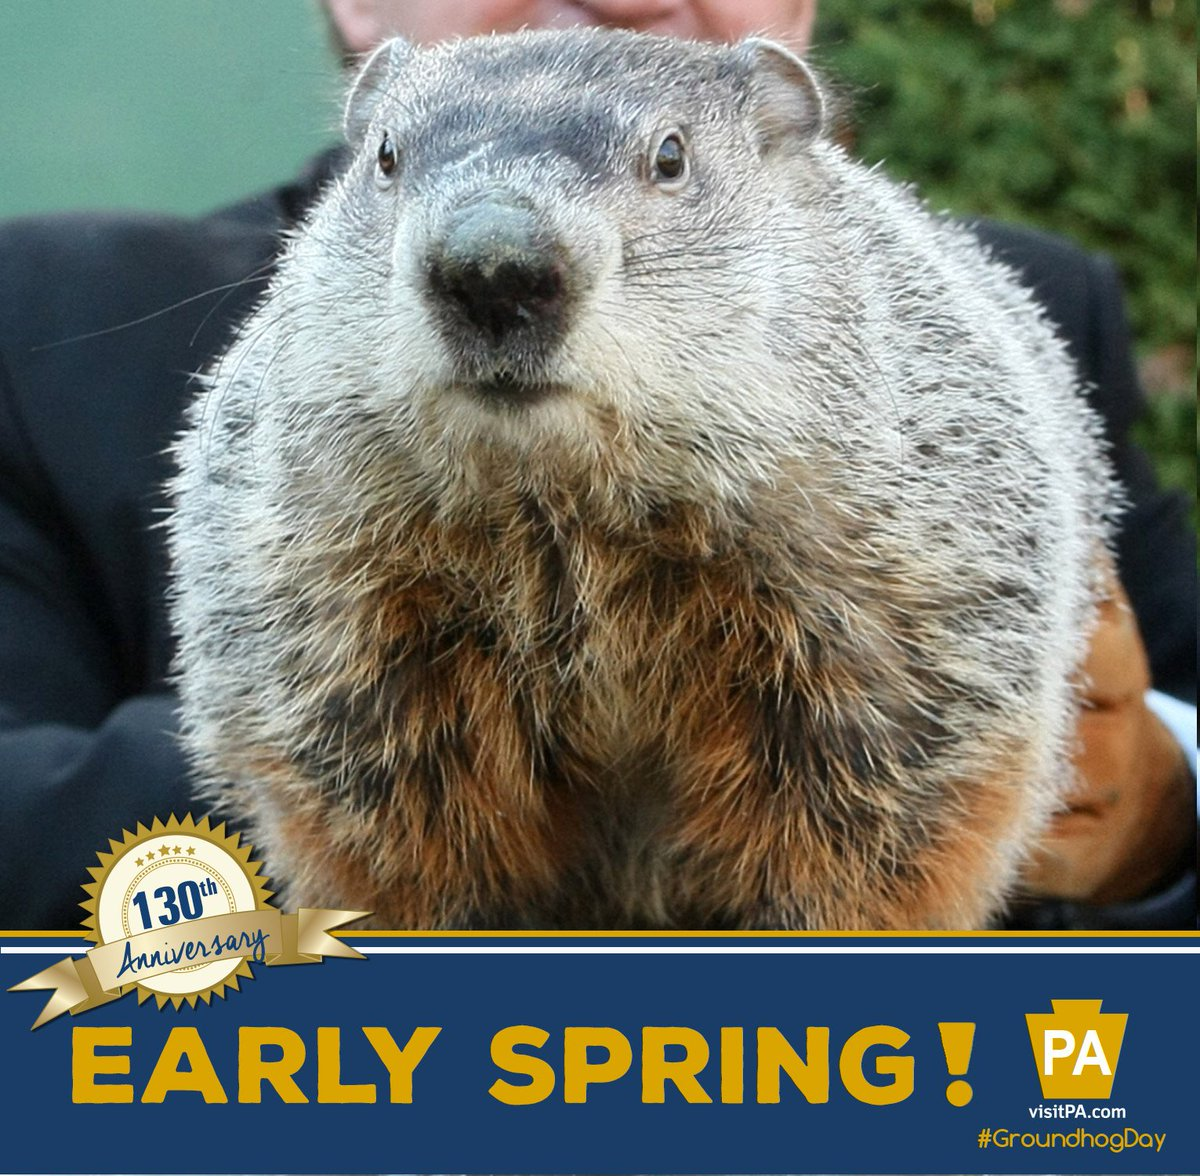 No shadow! Punxsutawney Phil predicts an early spring! #GroundhogDay #GHD130 https://t.co/rTZBLBUZBS